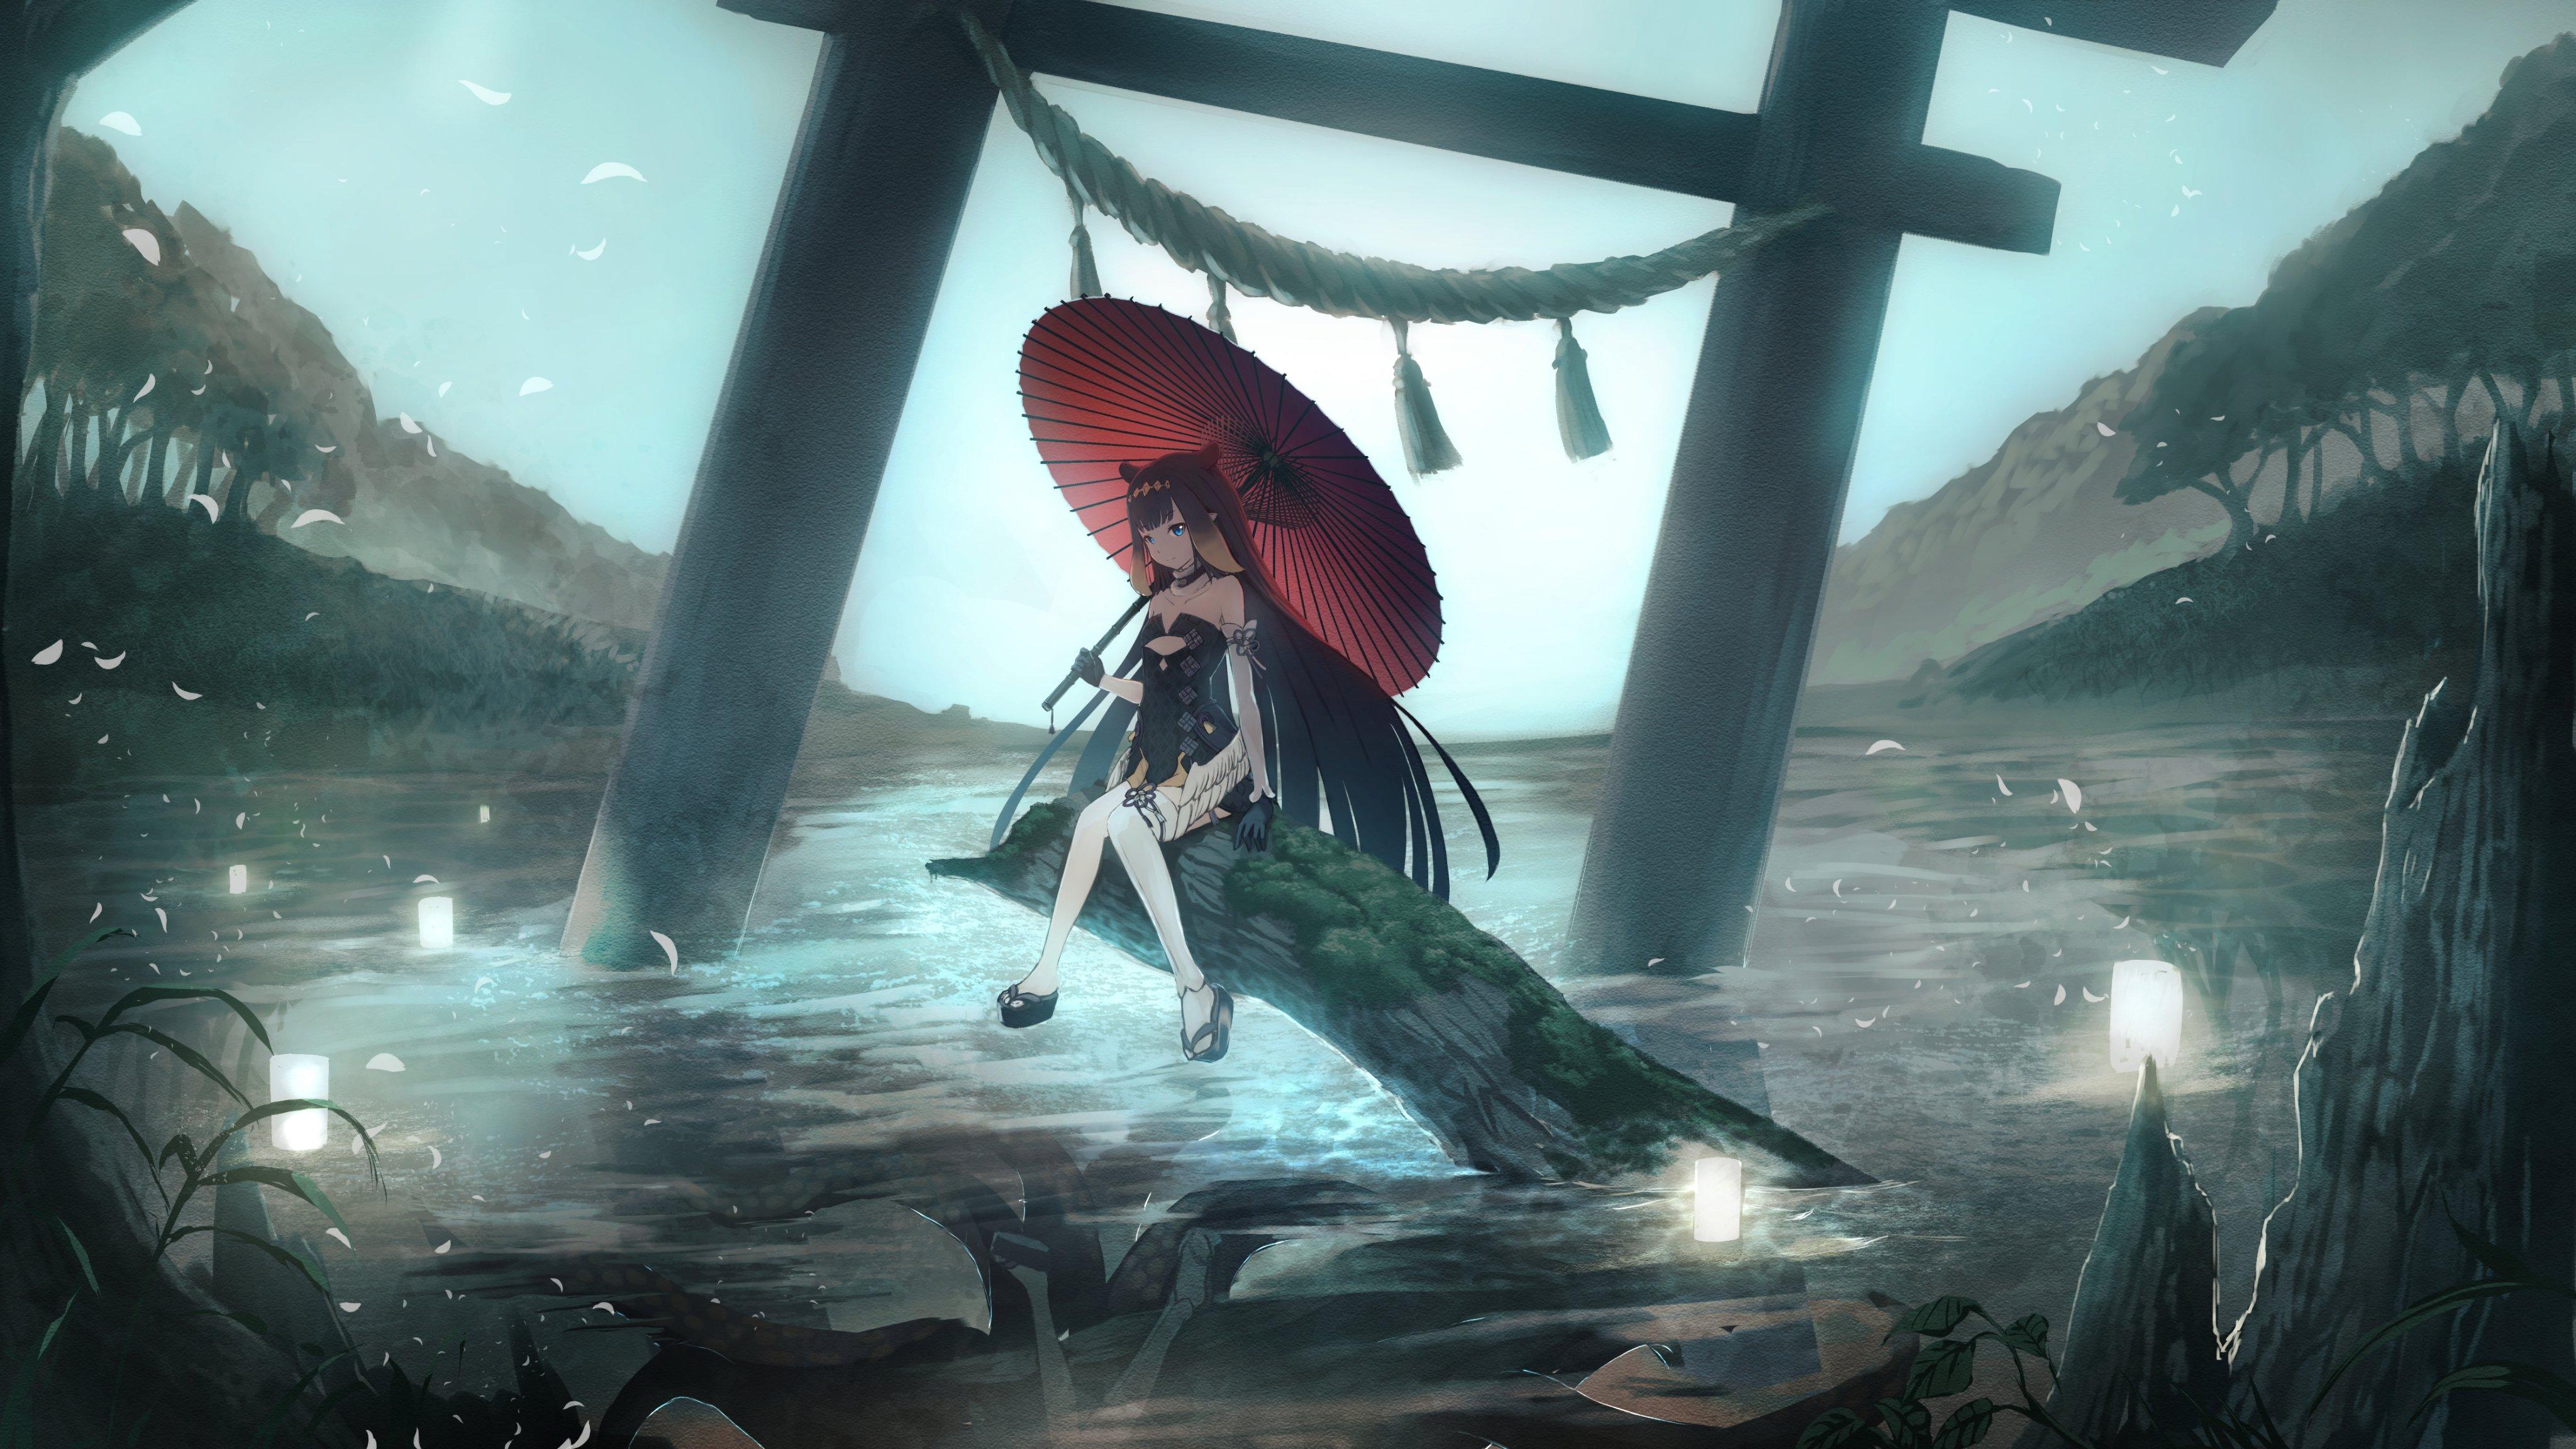 Anime 4096x2304 Hololive Virtual Youtuber Ninomae Ina'nis umbrella water long hair anime anime girls moescape Namako